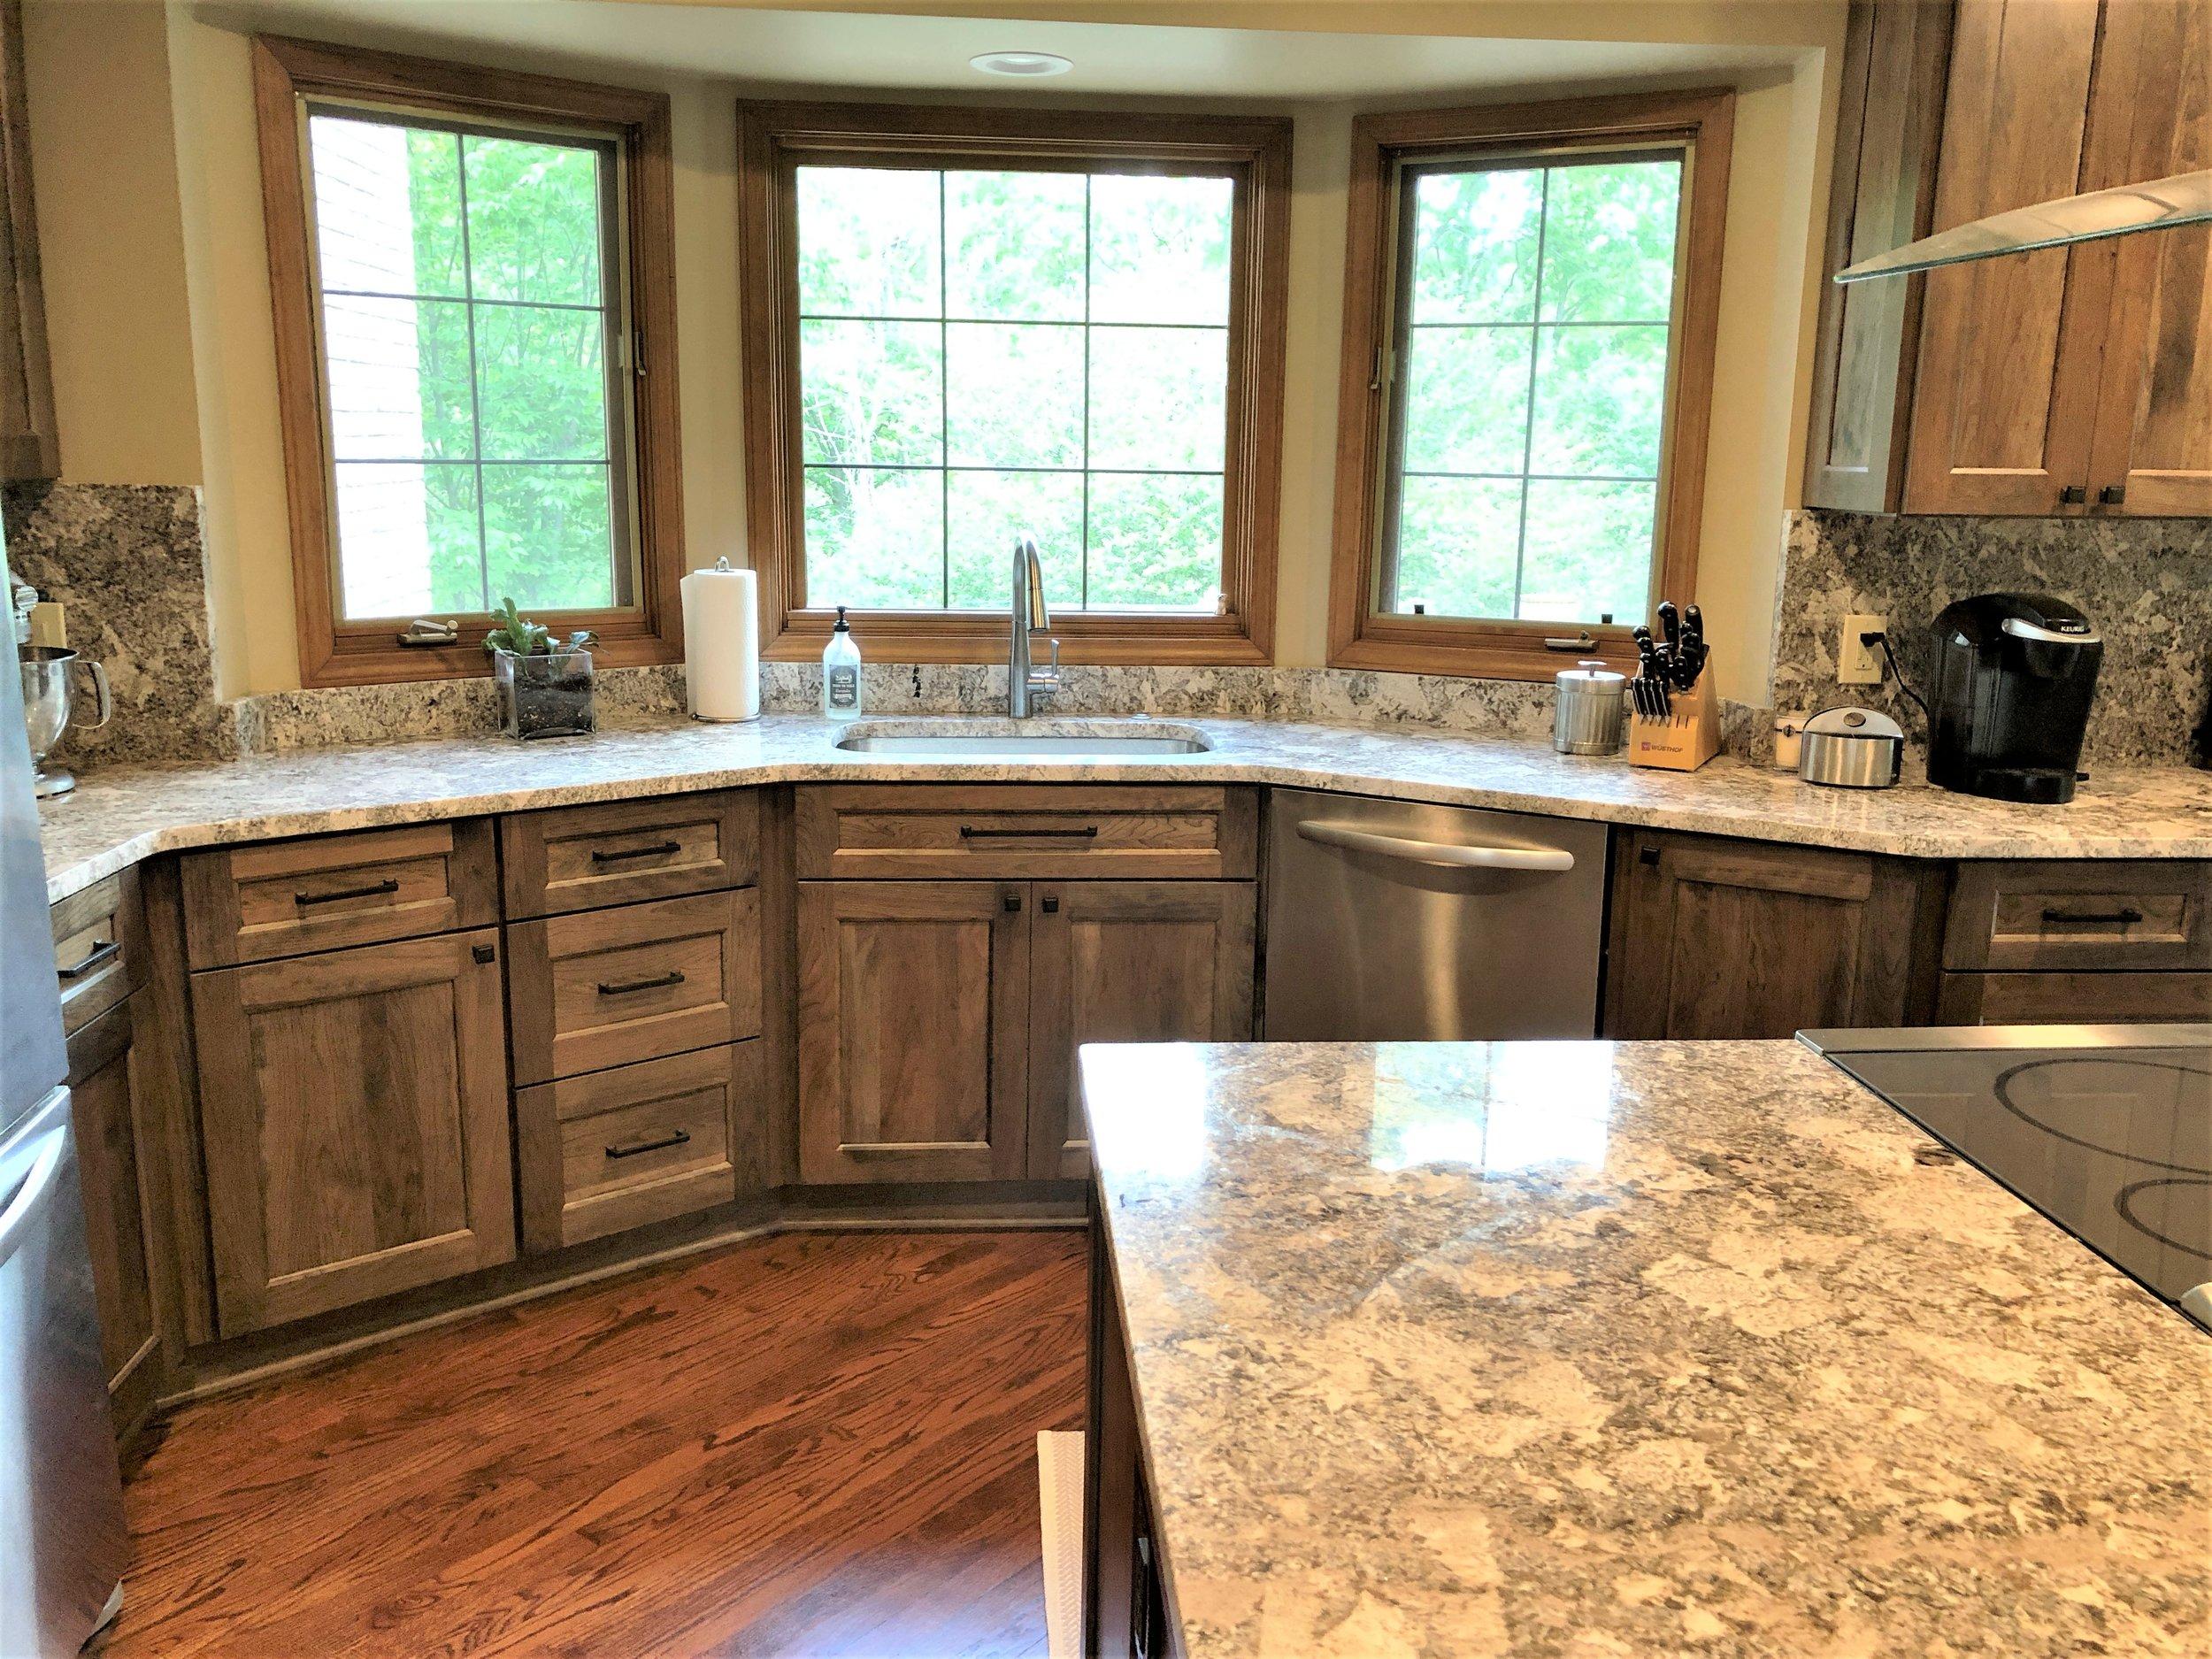 Updated kitchen renovation